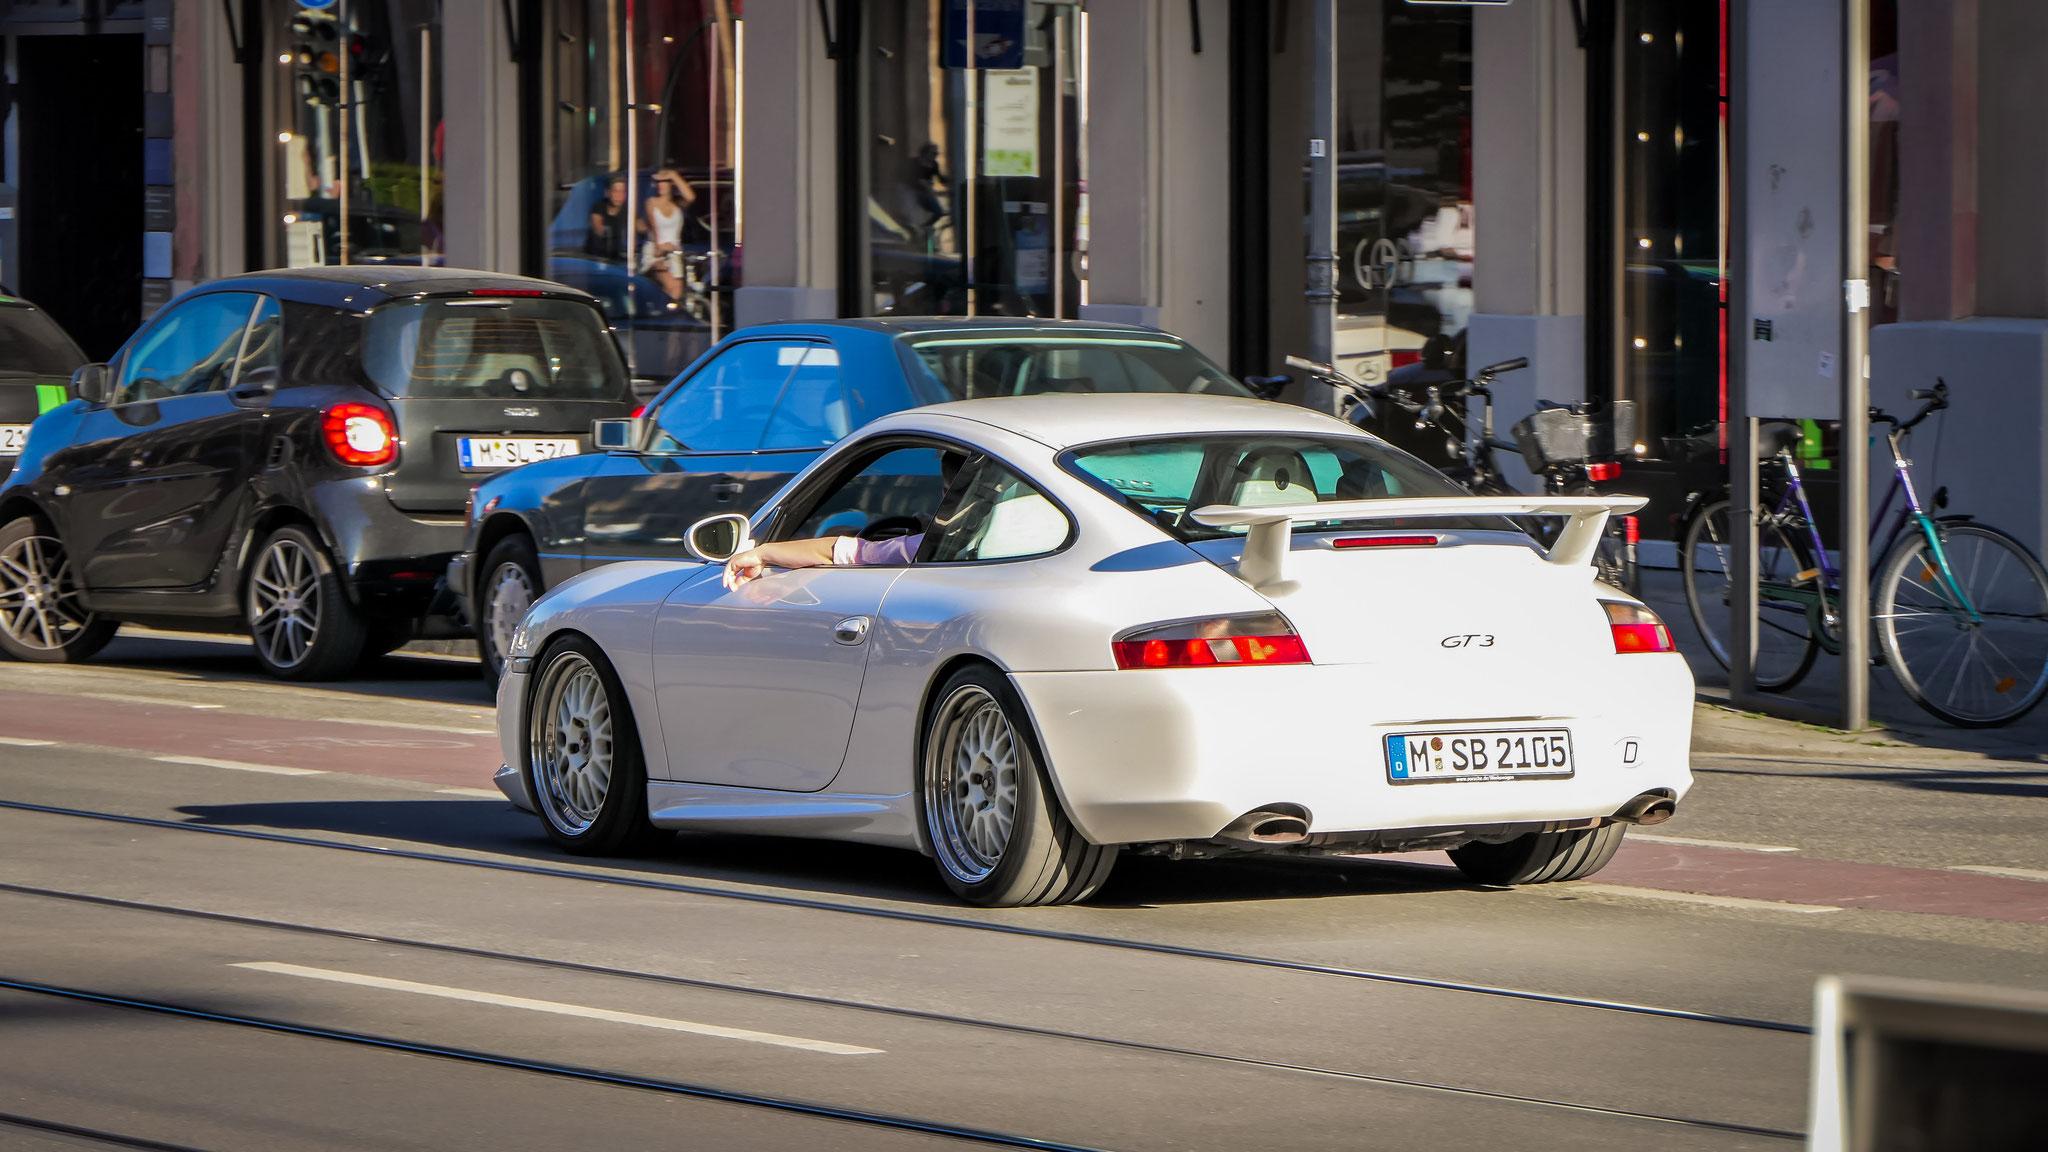 Porsche GT3 996 - M-SB-2105